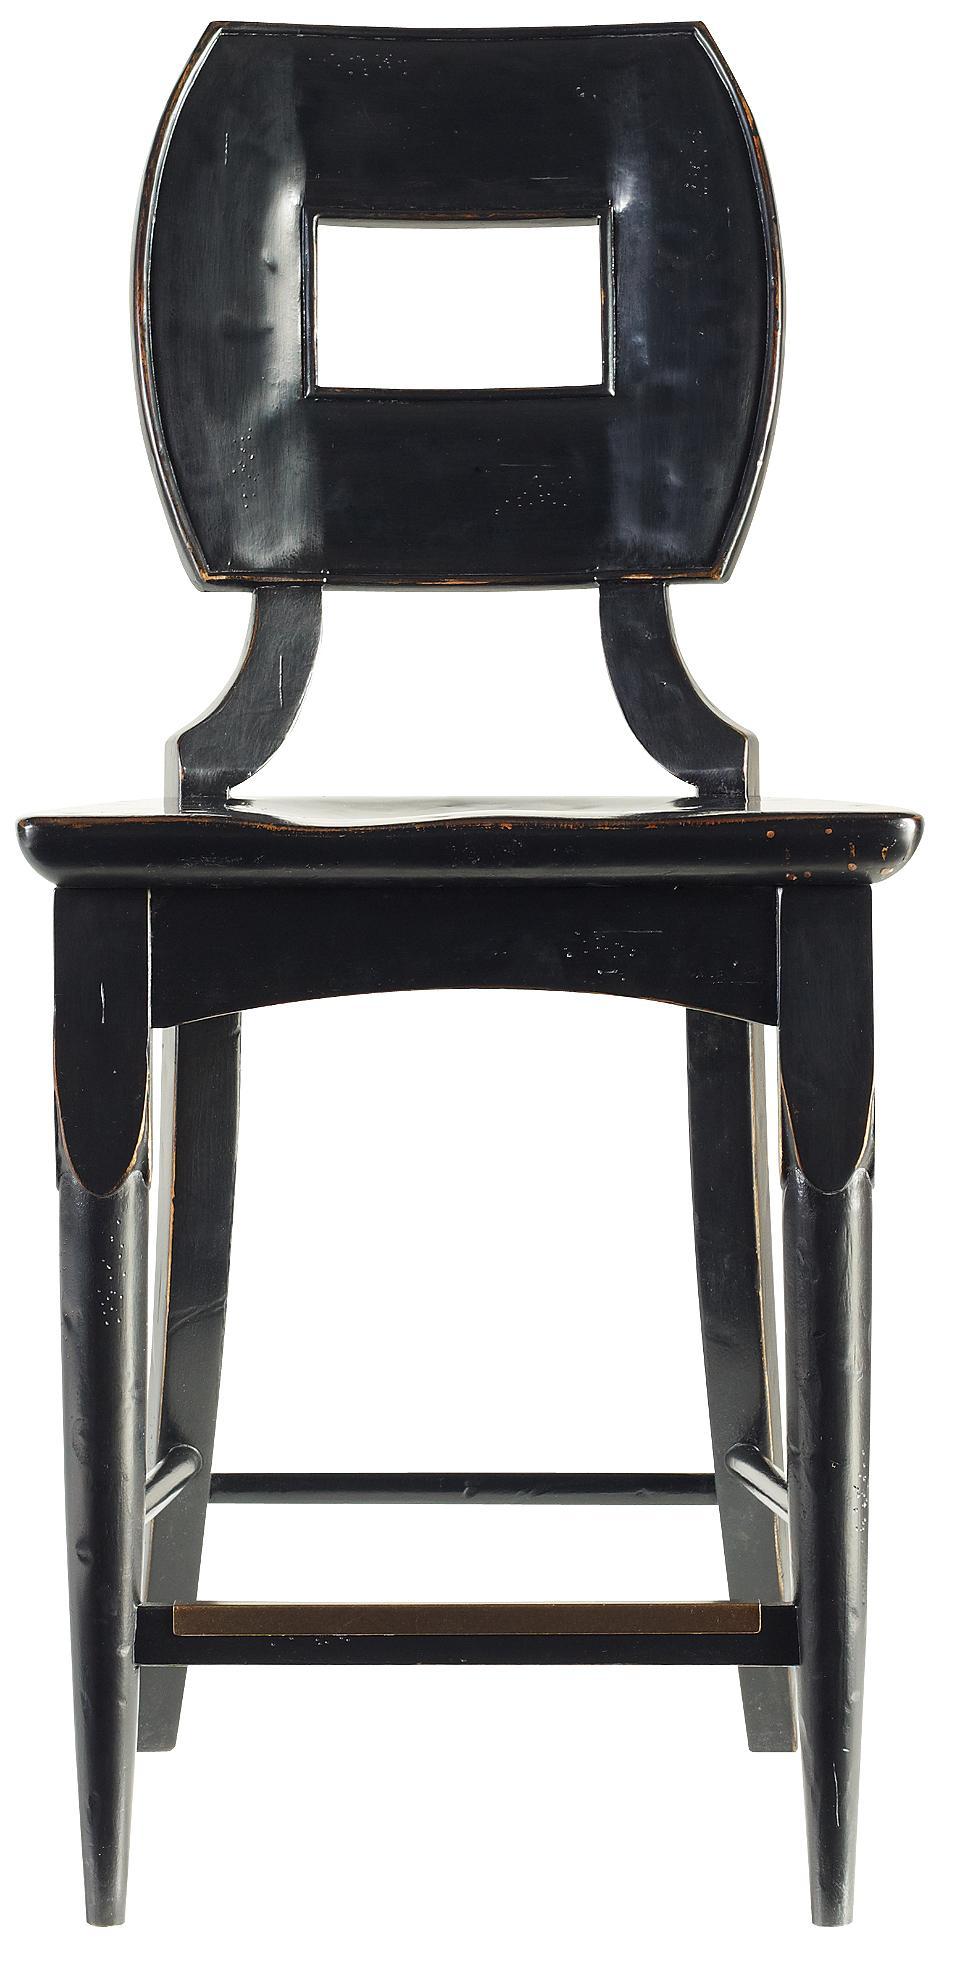 Stanley Furniture The Classic Portfolio Artisan Counter Stool - Item Number: 135-81-72